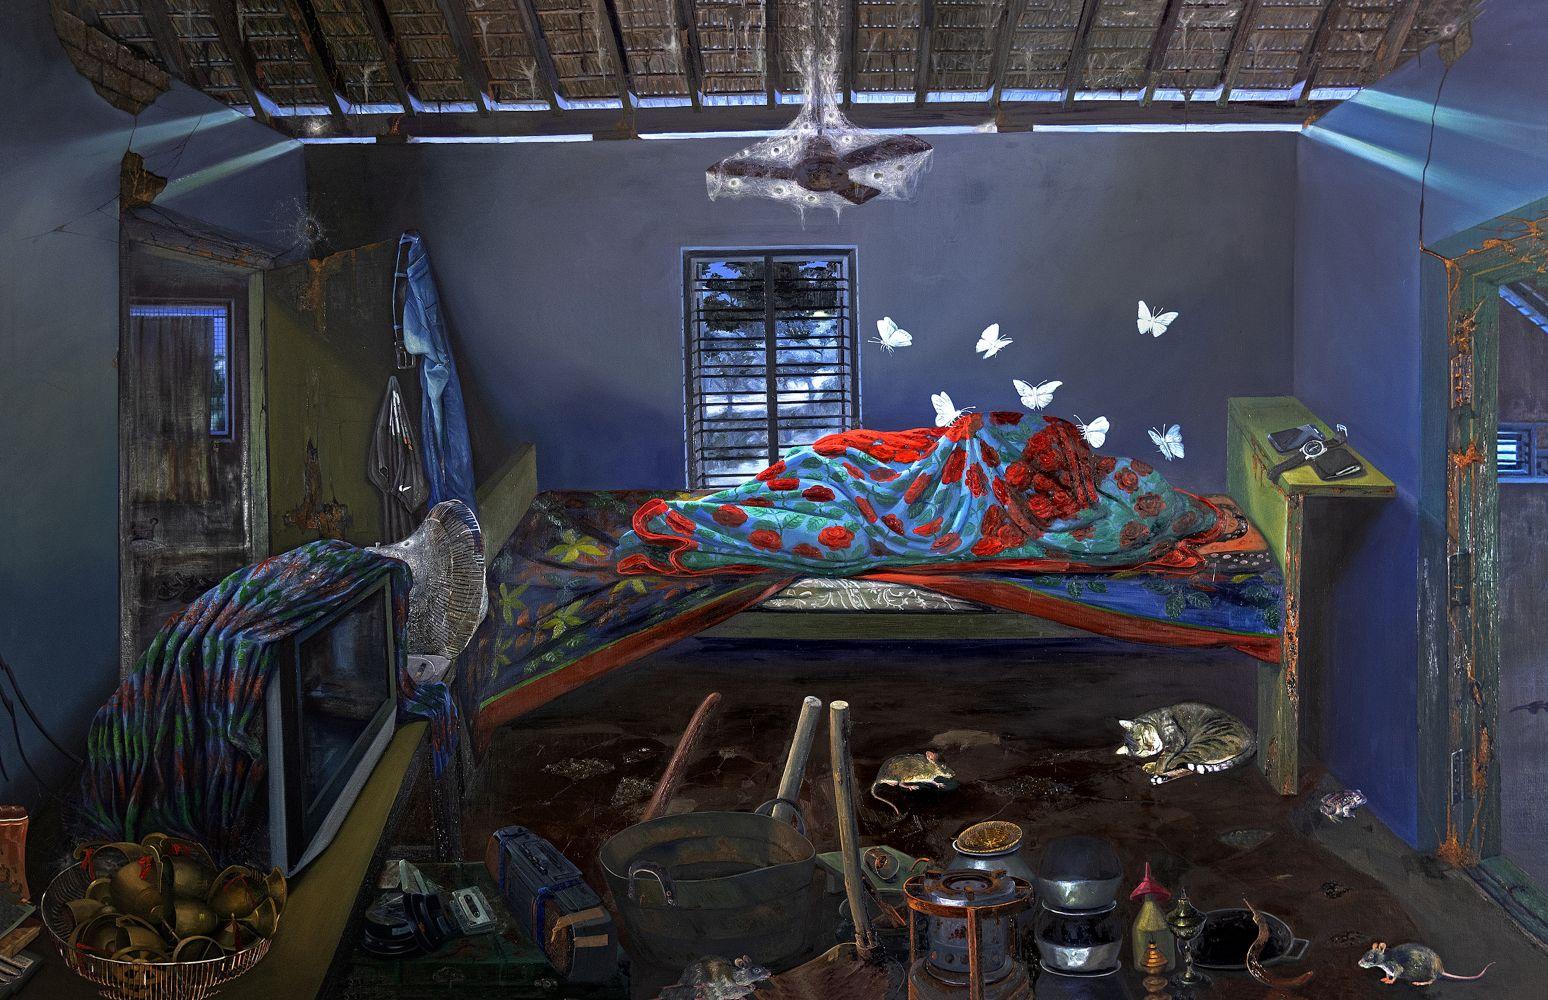 RATHEESH T. AmmaVeedu, 2019  Oil on canvas  78 x 120.5 in / 198 x 306 cm   Collection: Zuzeum Art Centre, Riga, Latvia